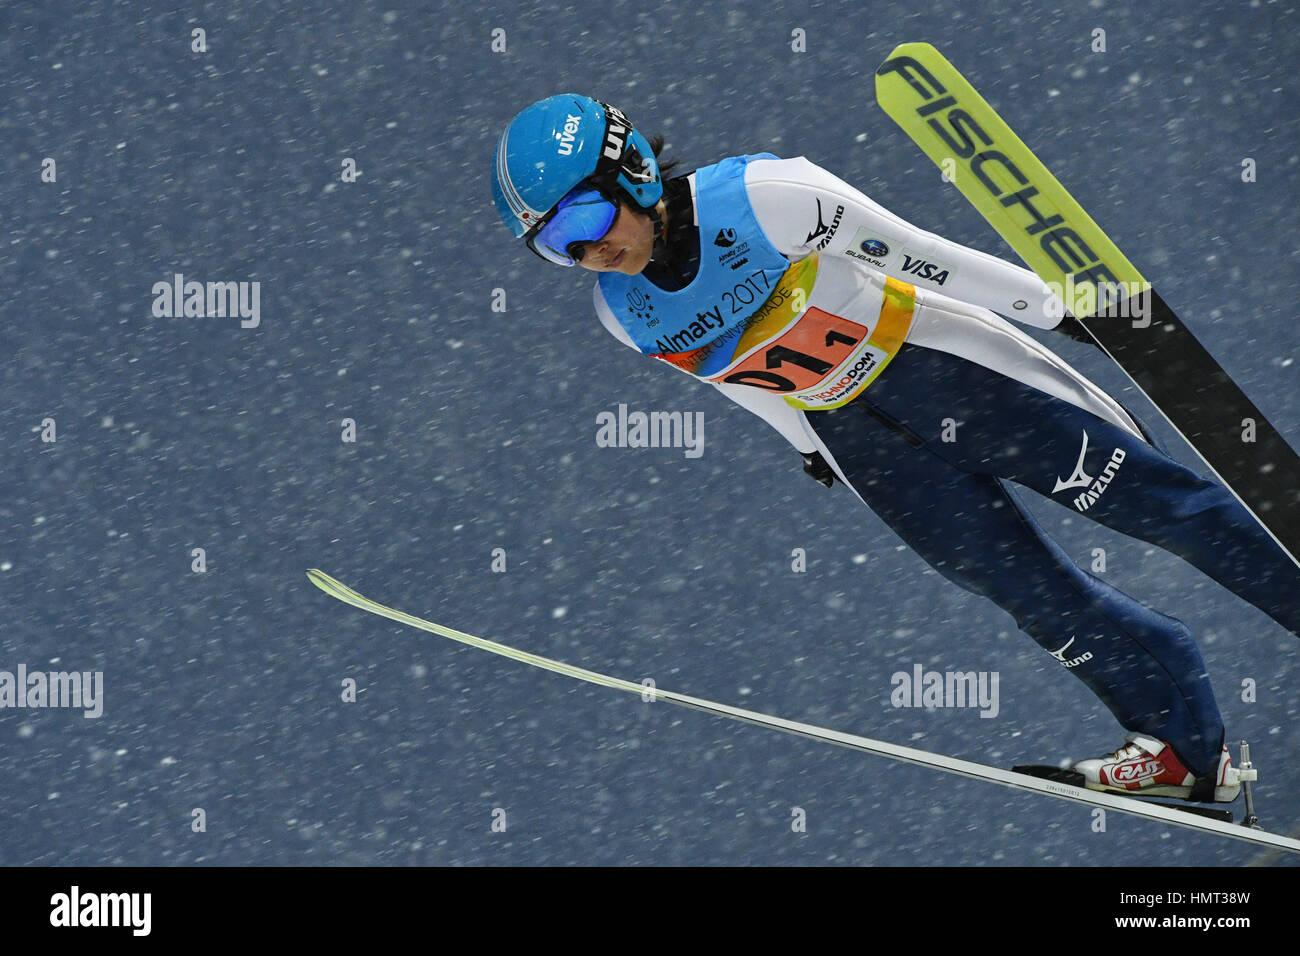 Sunkar International Ski Jumping complessa, Almaty, Kazakhstan. 4 febbraio, 2017. Jun Maruyama (JPN), 4 febbraio Foto Stock